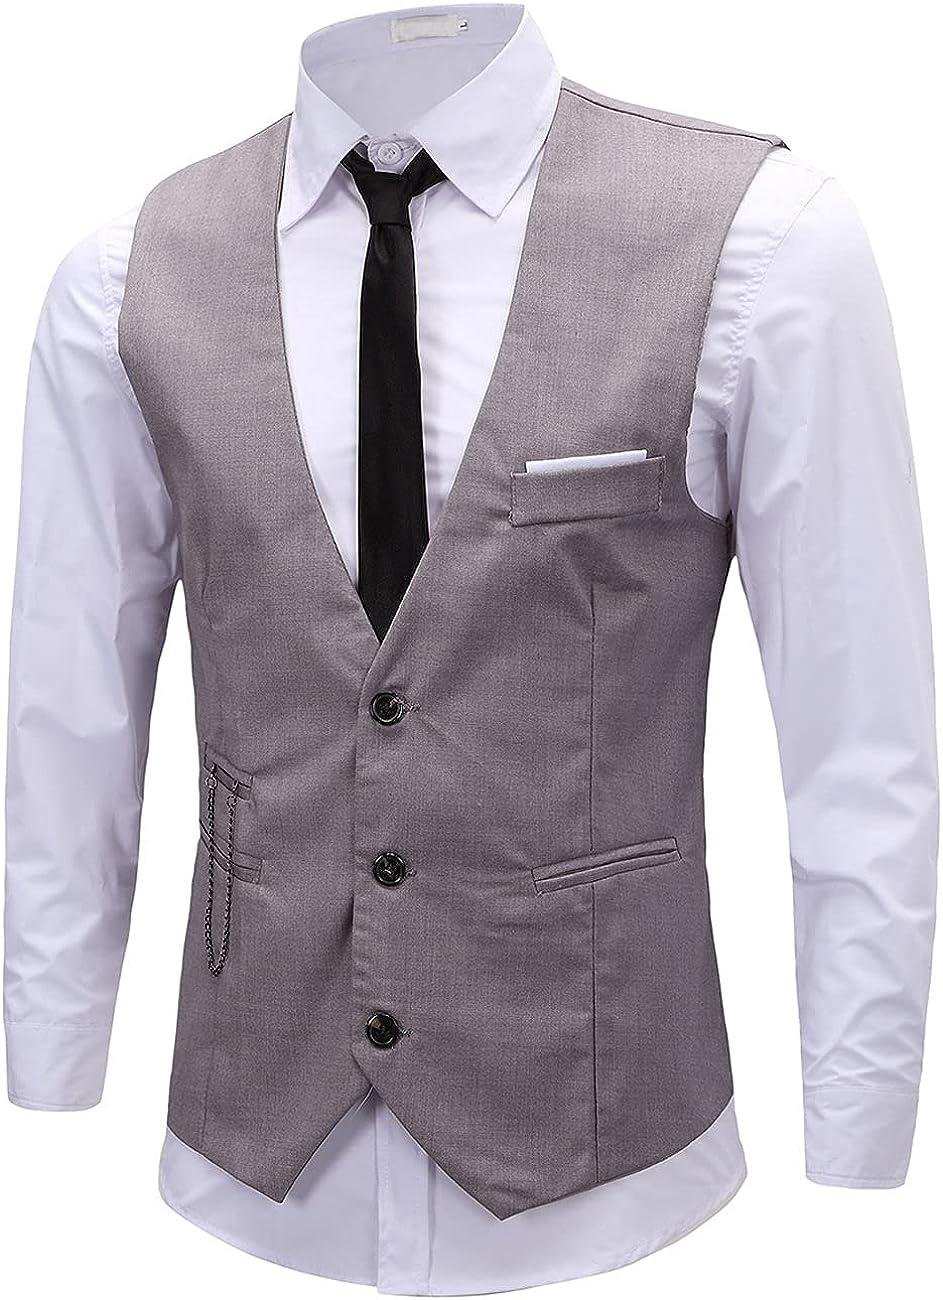 ERZTIAY Men's Formal Dress Business Slim Fit Sleeveless Jacket Vest Waistcoat